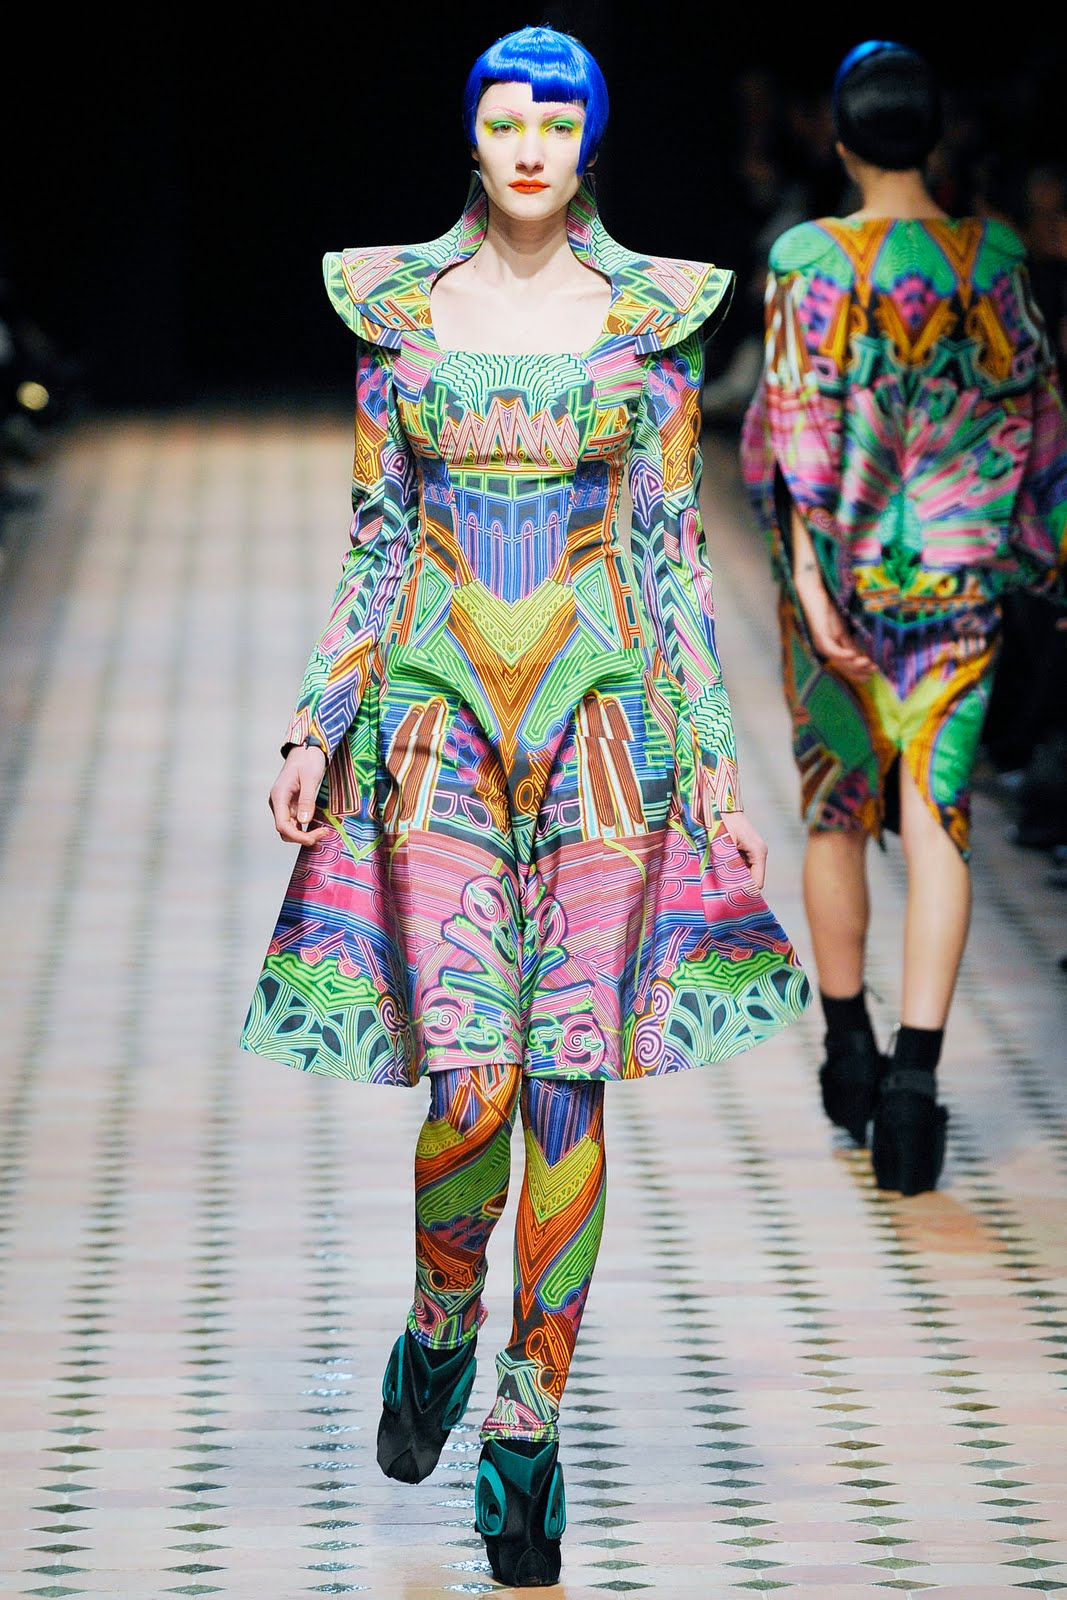 (Cirkumfleks) Magazine: Fashion Designer: Manish Arora